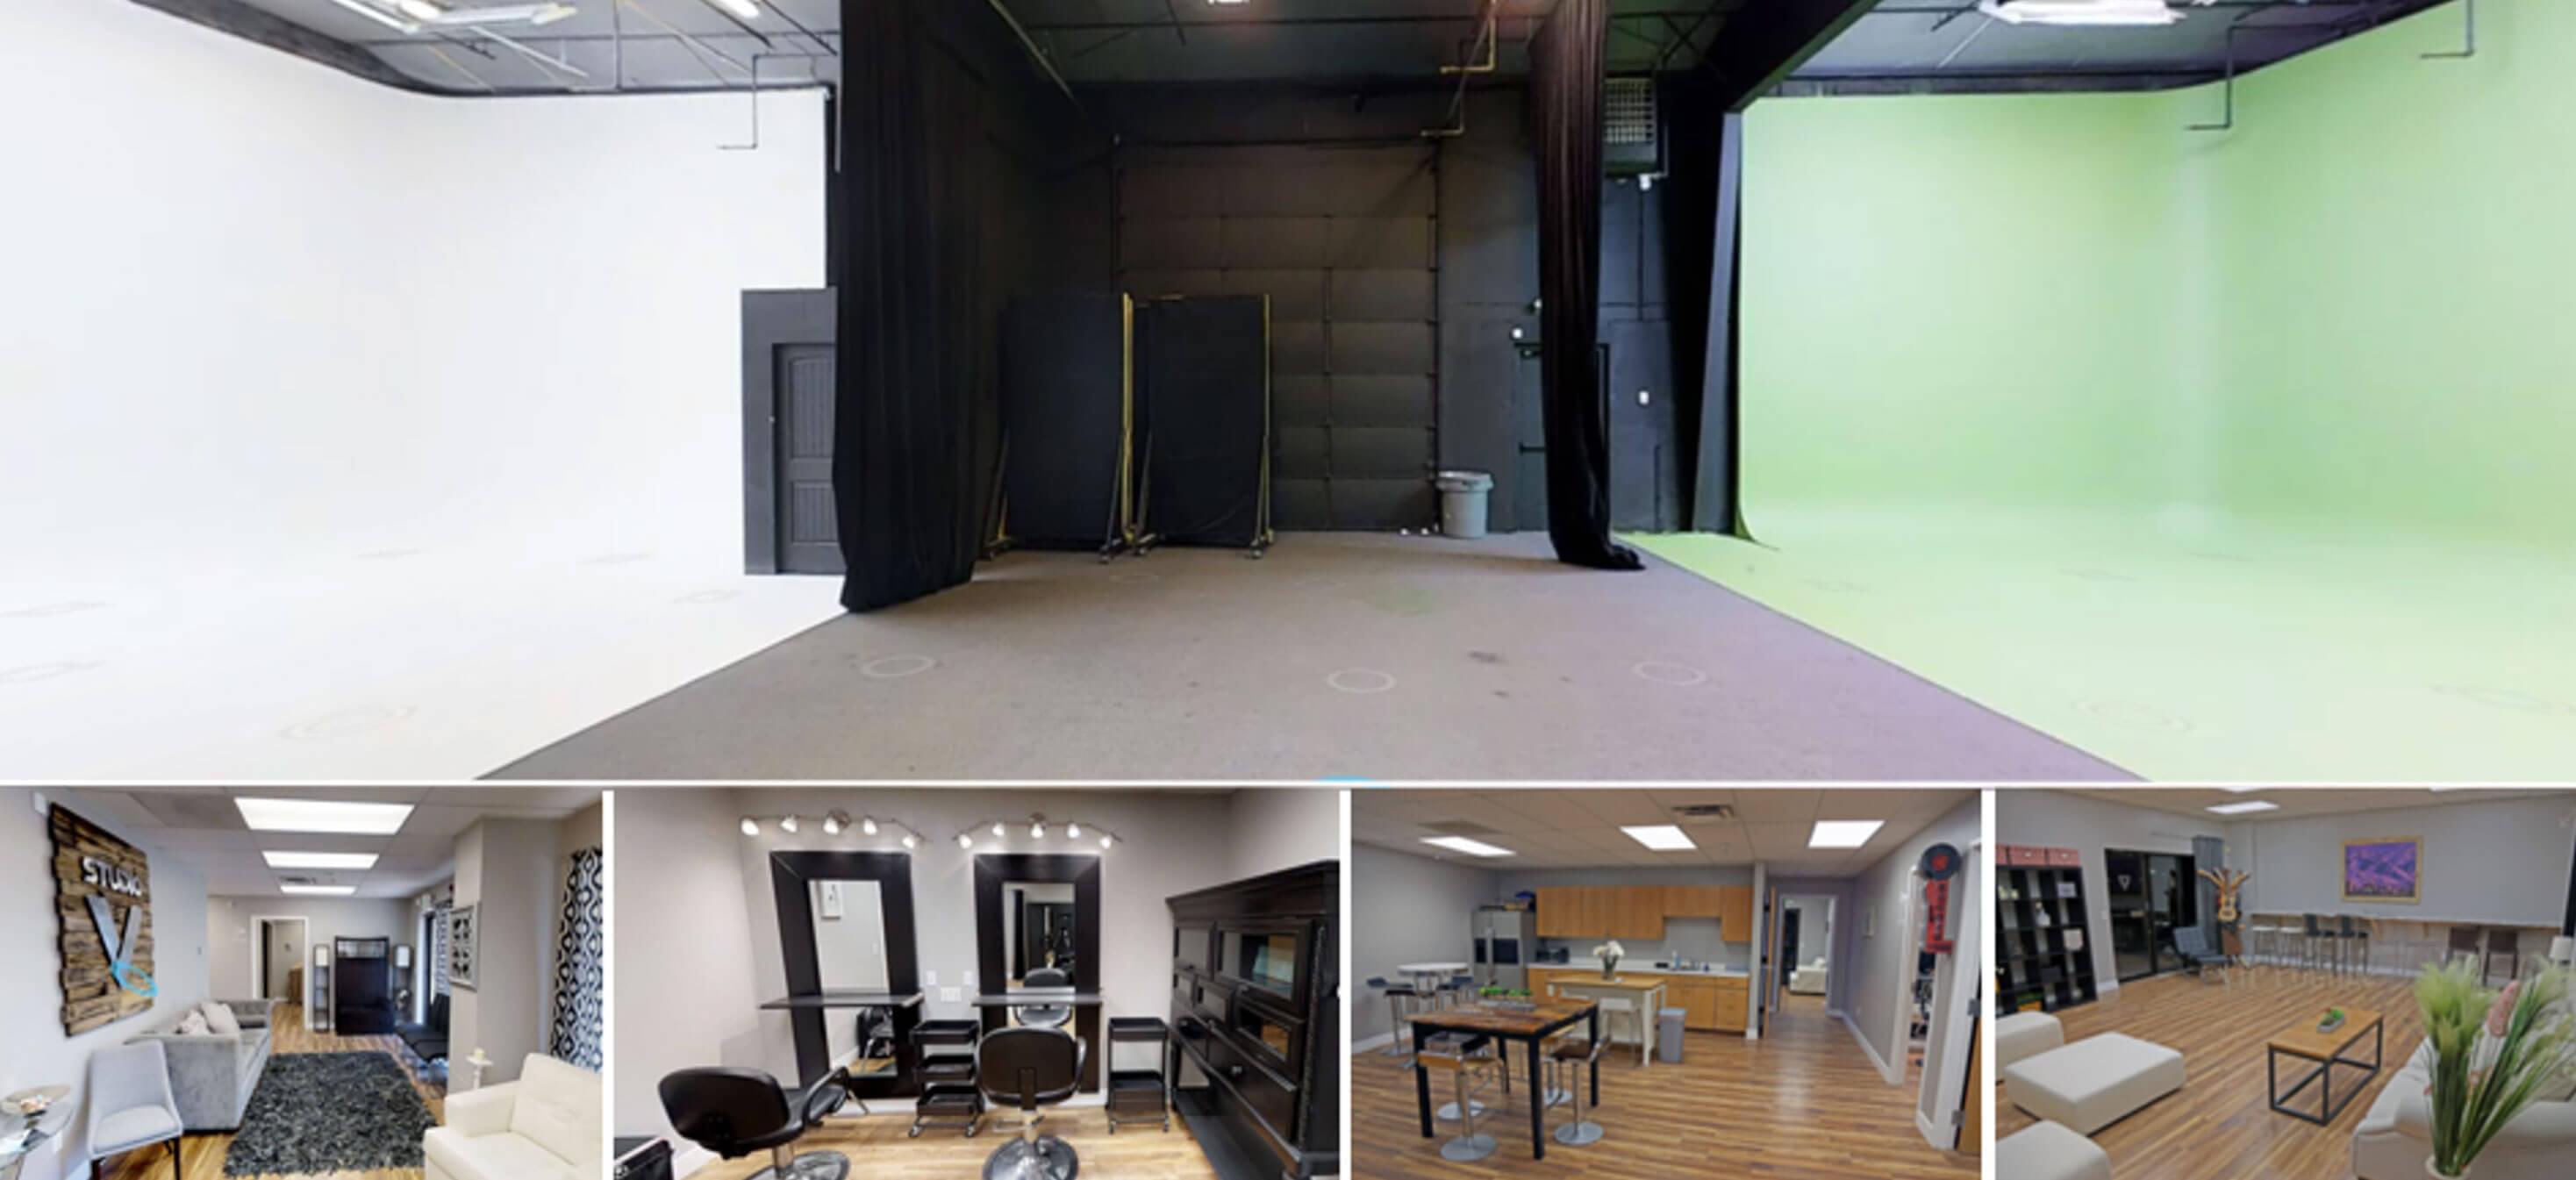 Studio v salt lakes premier video production environment solutioingenieria Gallery